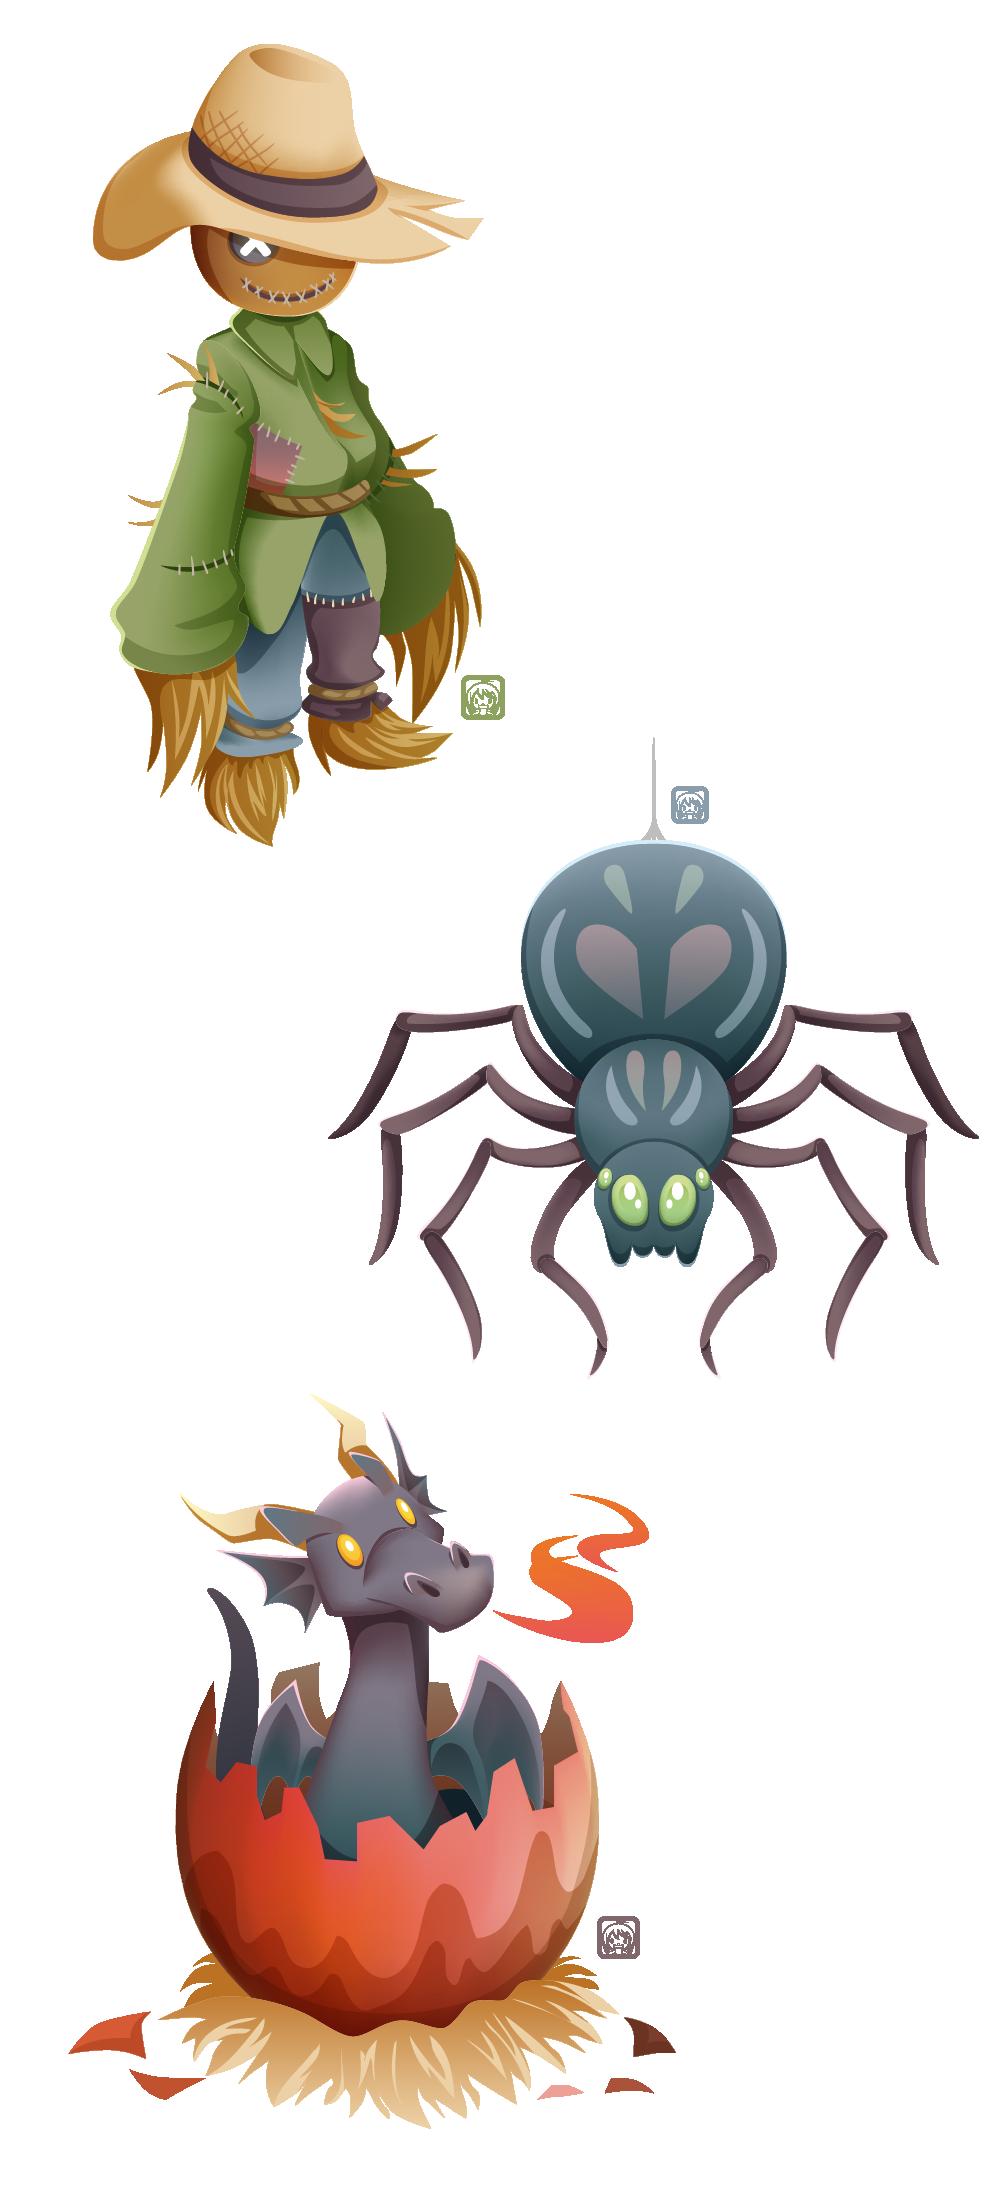 Halloween drawlloween inktober monster vector art witch mummy skeleton Candies Sweets scarecrow Cat spider spooky kids